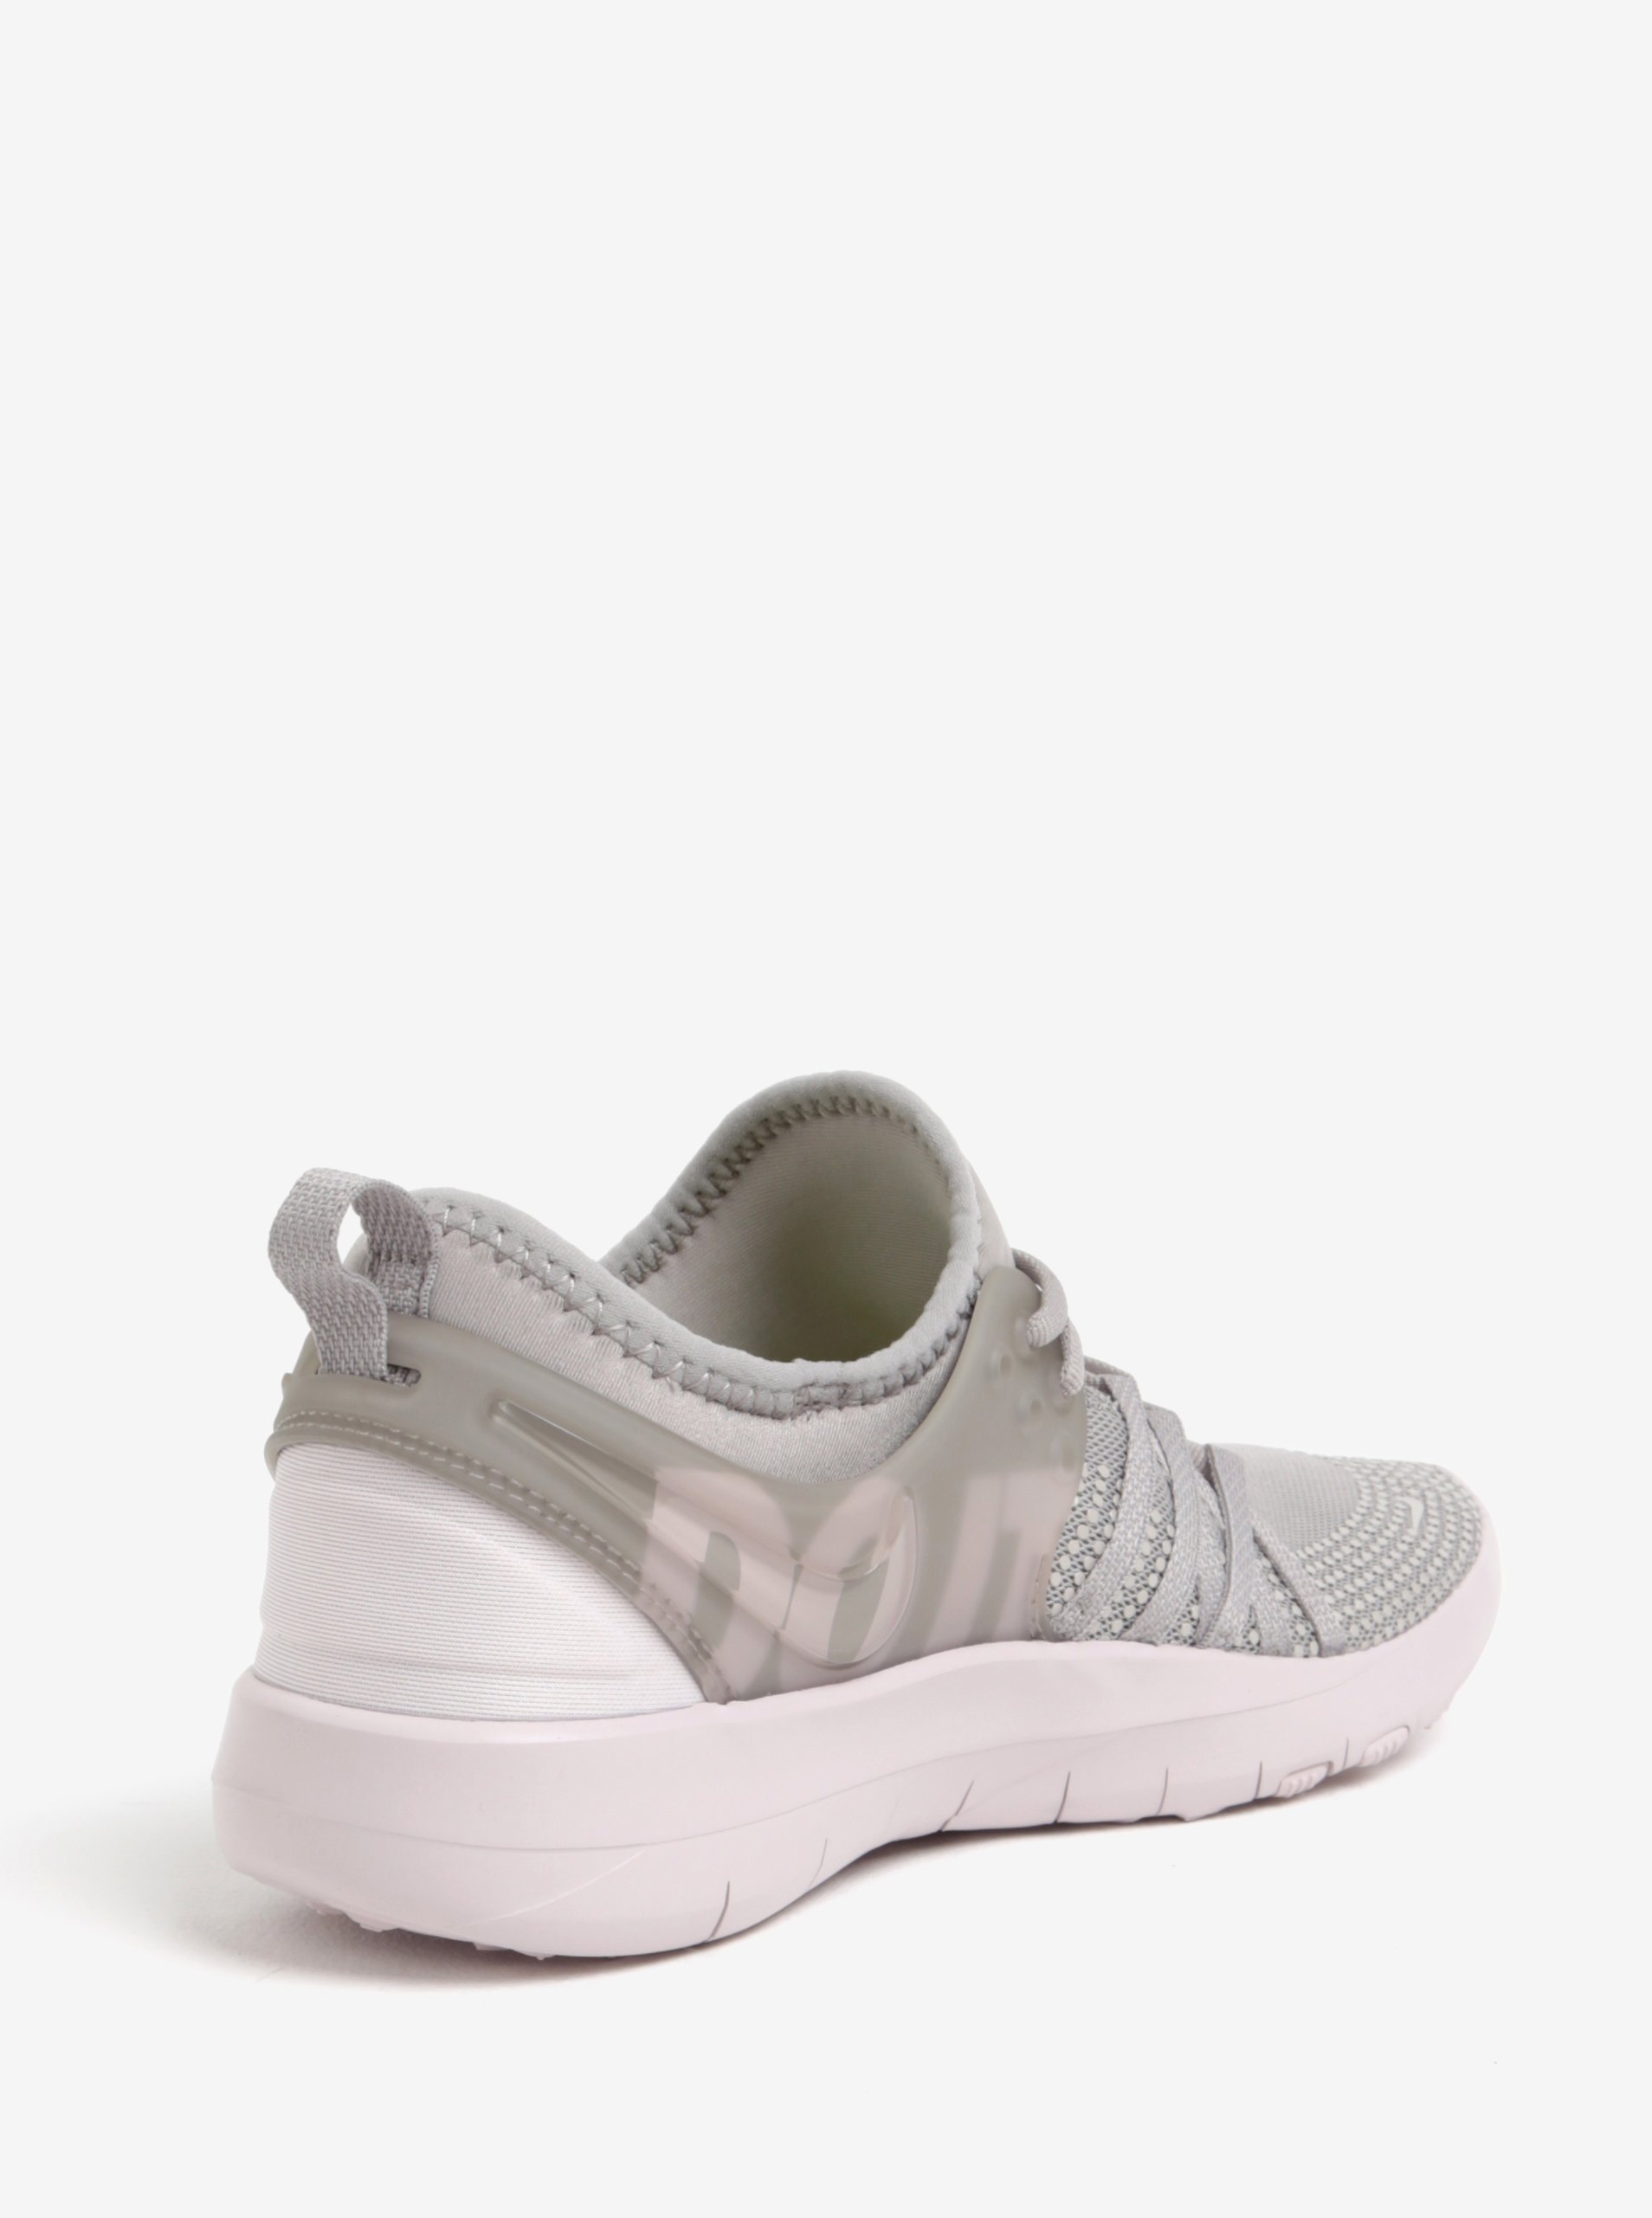 9f423d19a7c26 Svetlosivé dámske tenisky Nike Free TR 7 Premium Training | ZOOT.sk